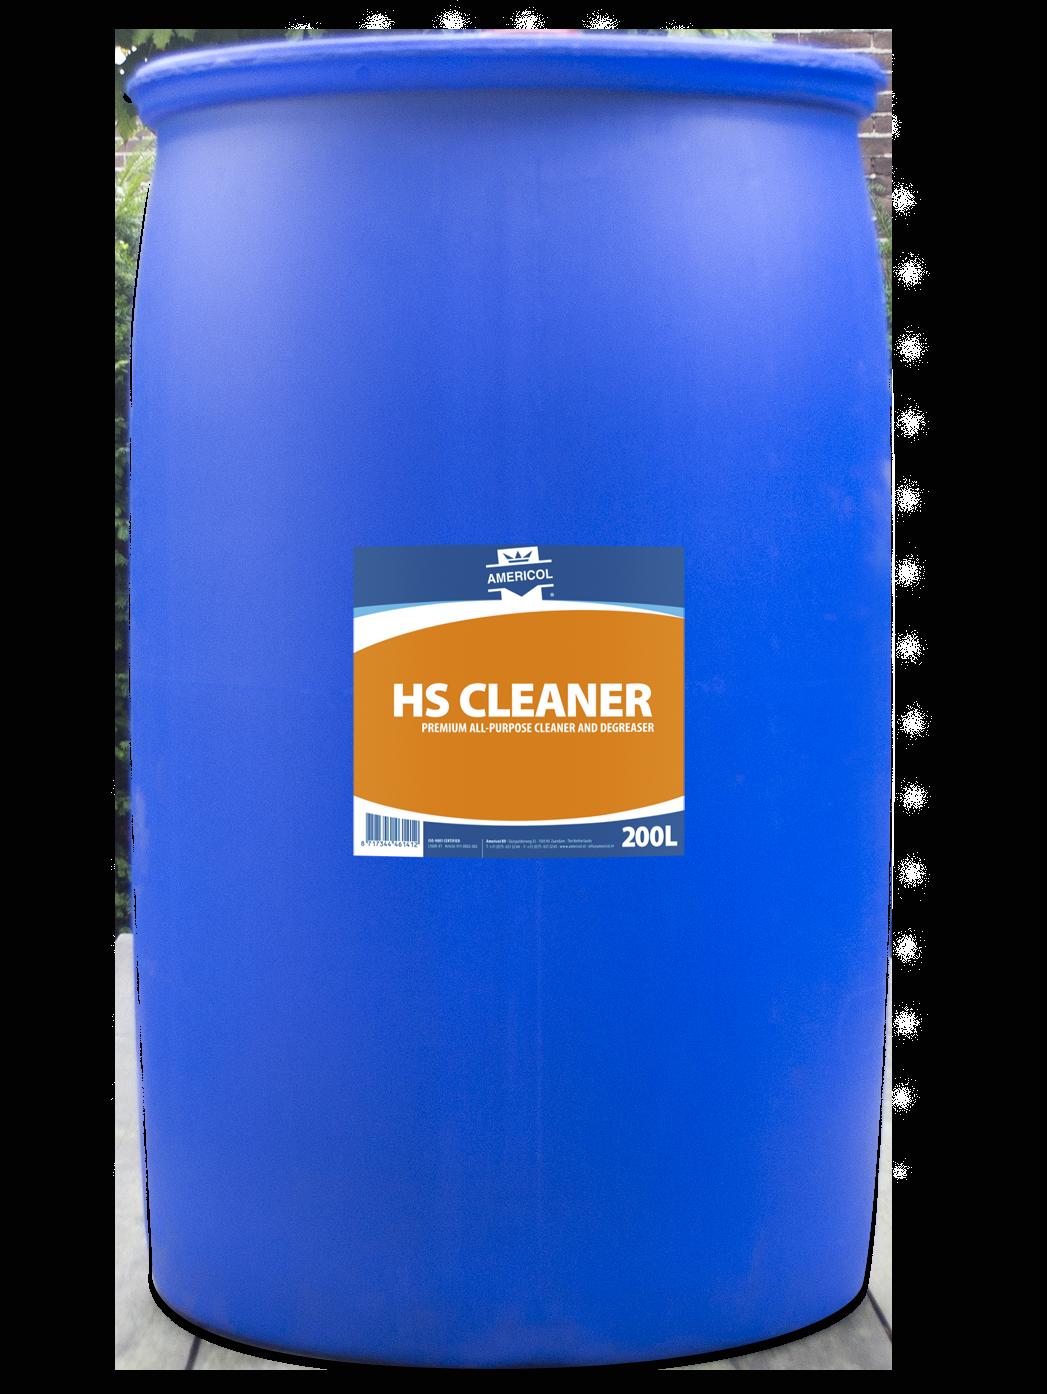 HS Cleaner 200 L